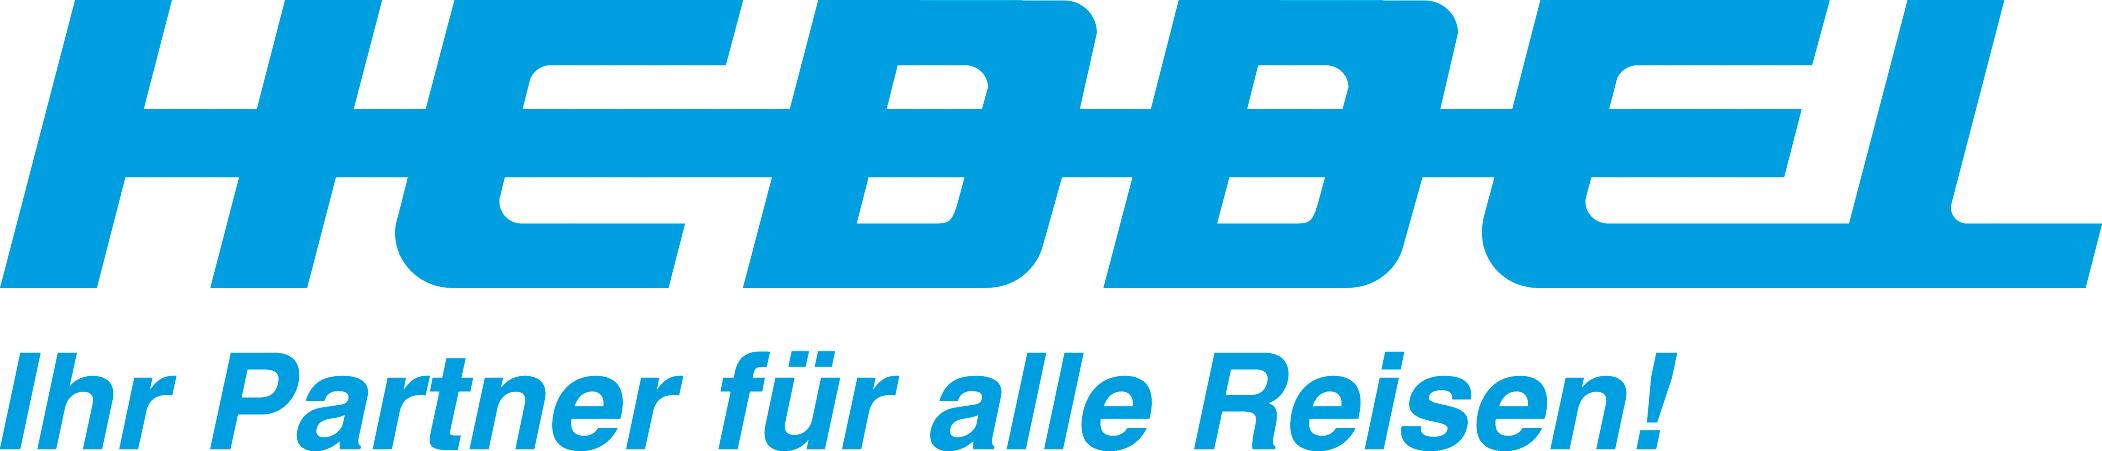 Reisebüro Hebbel Leverkusen-Opladen